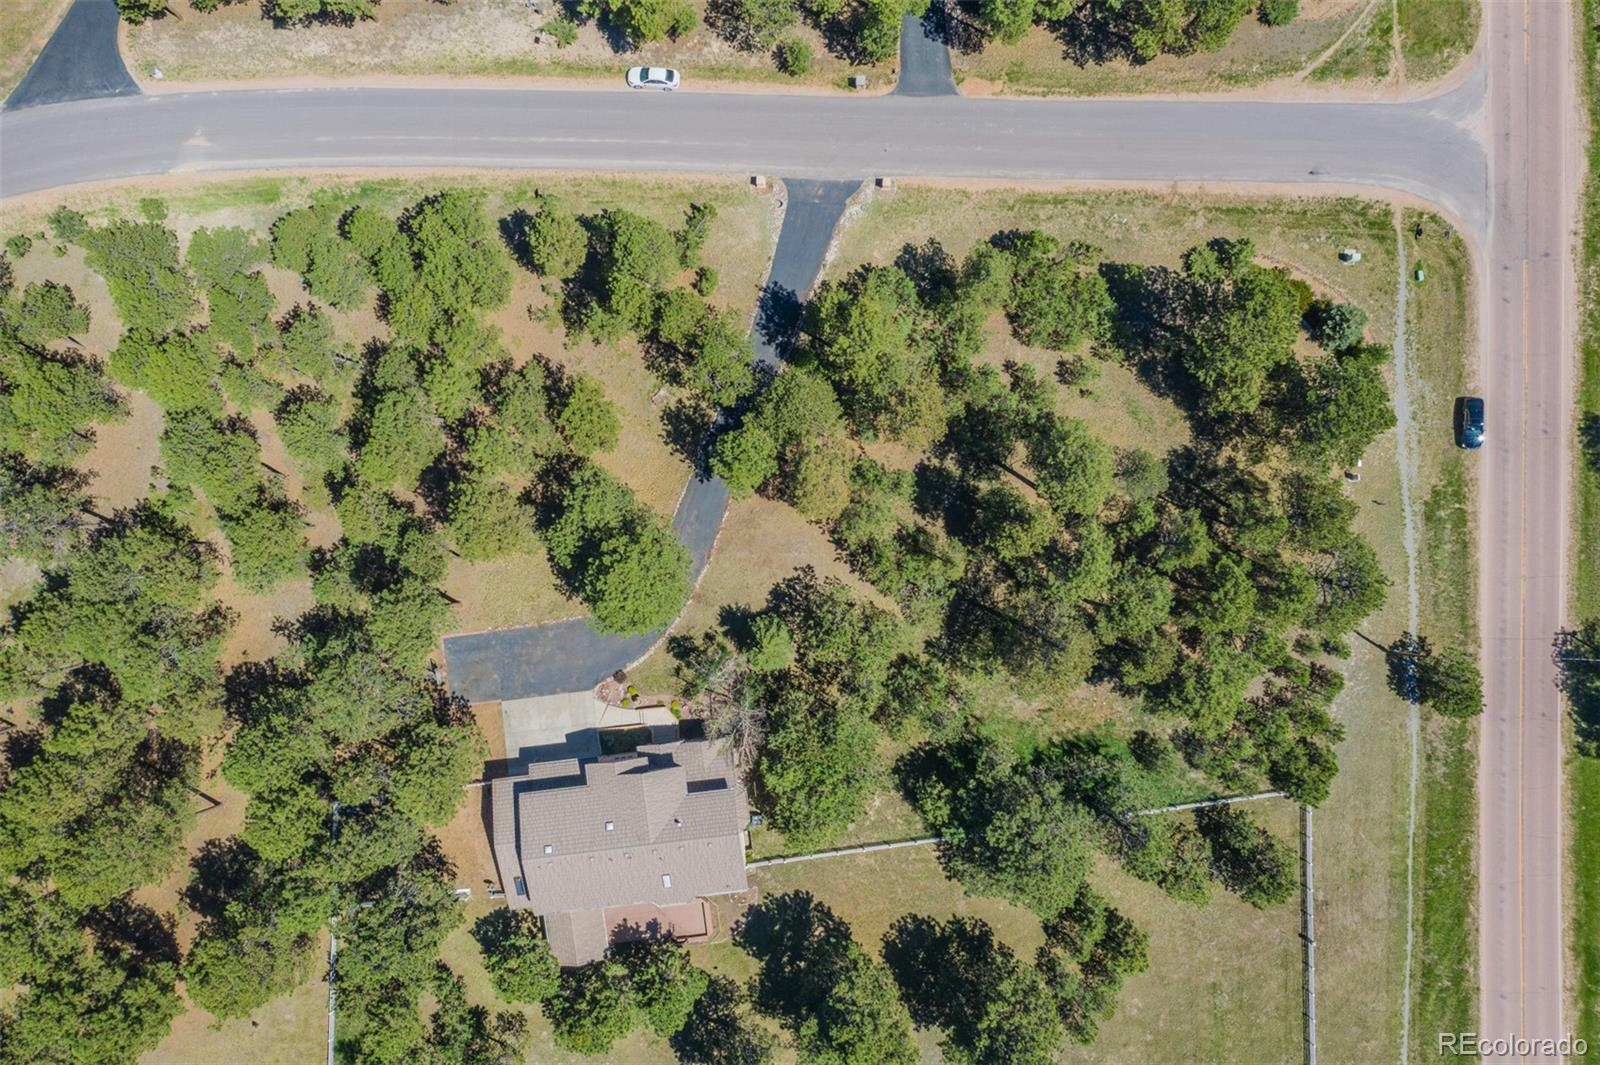 MLS# 2707350 - 7 - 17310 Charter Pines , Colorado Springs, CO 80132